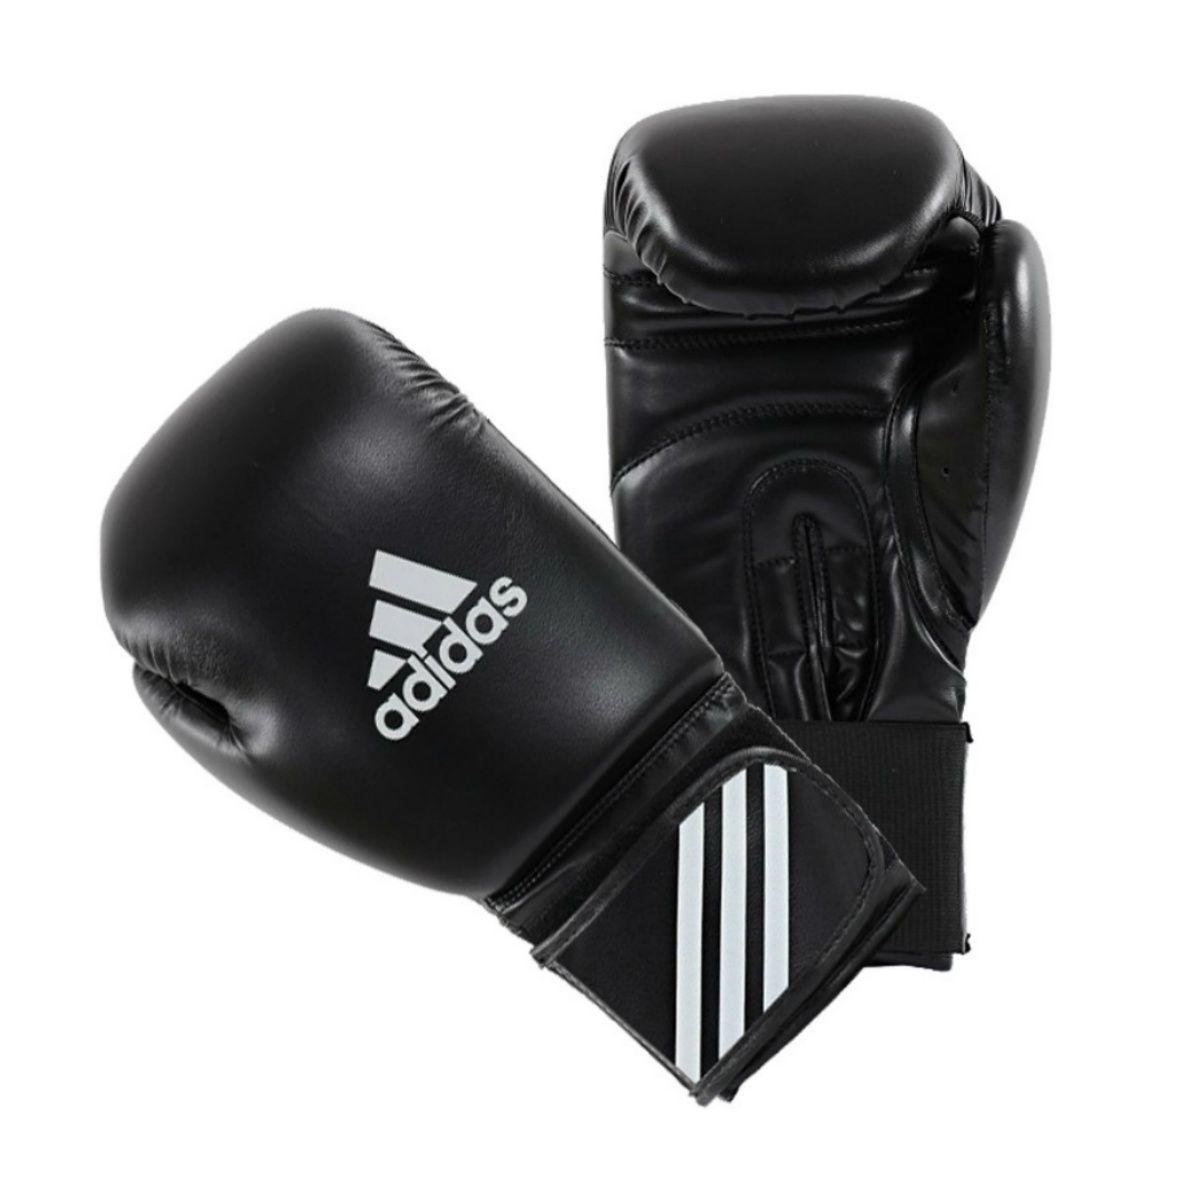 694e6156d ... Kit Luva de Boxe Muay Thay Adidas Speed 50 + Bandagem 2